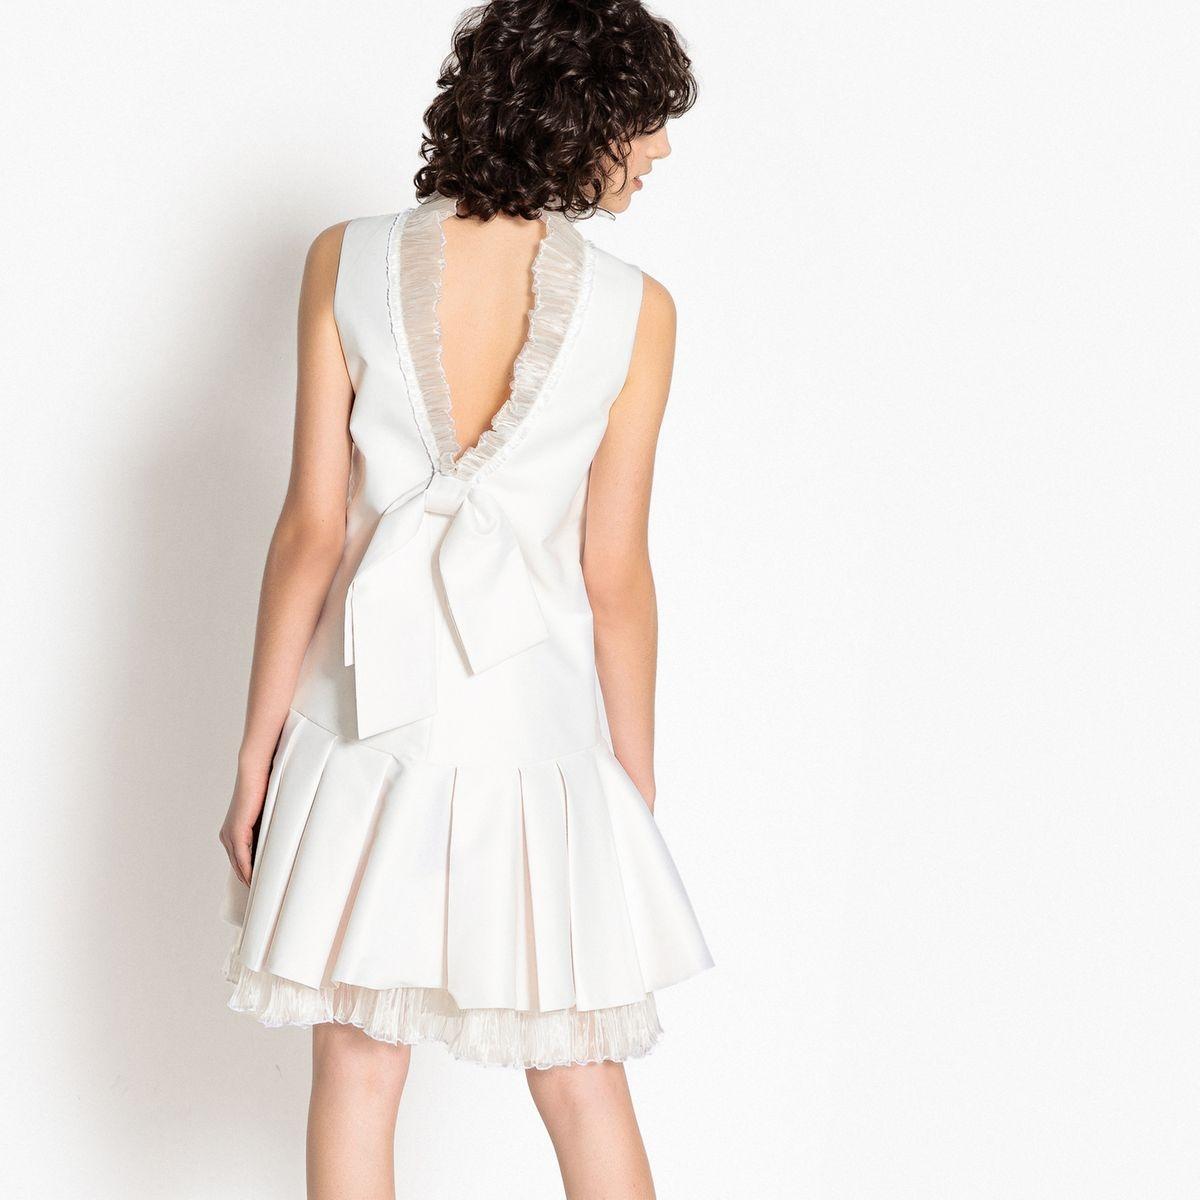 Robe de mariée courte, tulle, joli dos avec nœud